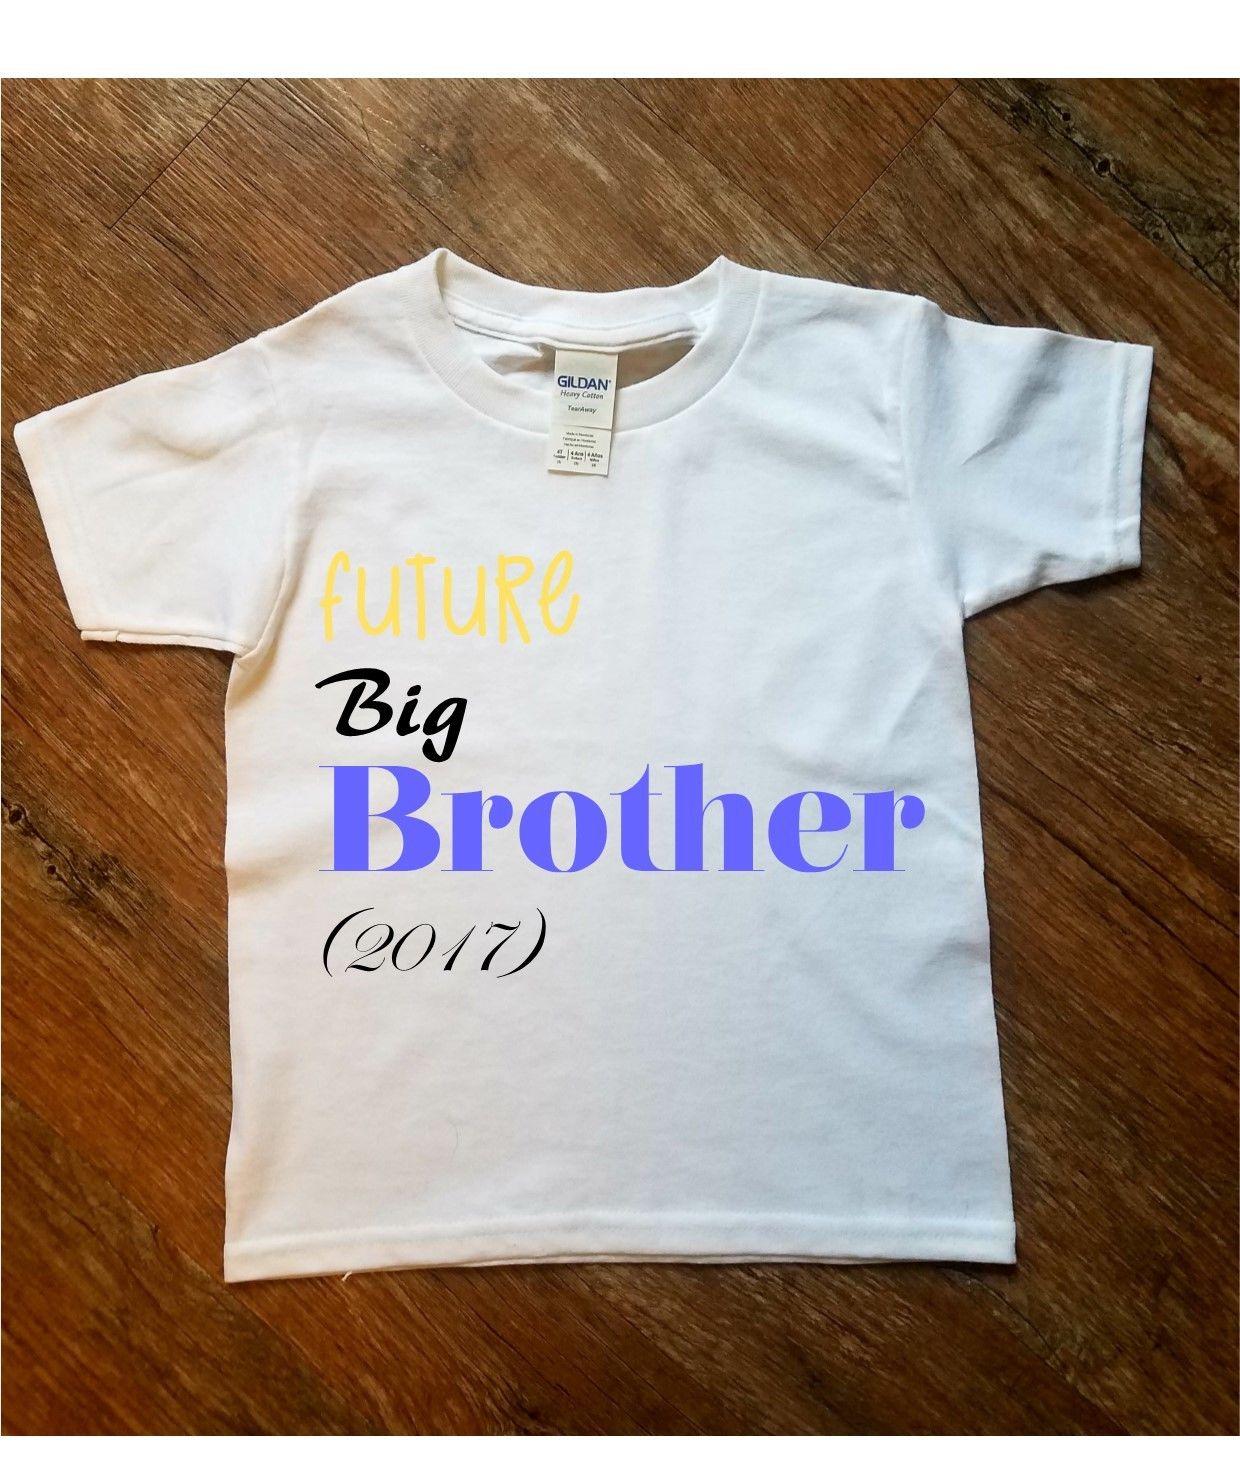 a85344810 Future Big Bro Brother Printed T Shirt Kids Joke Funny Cute Gift ...